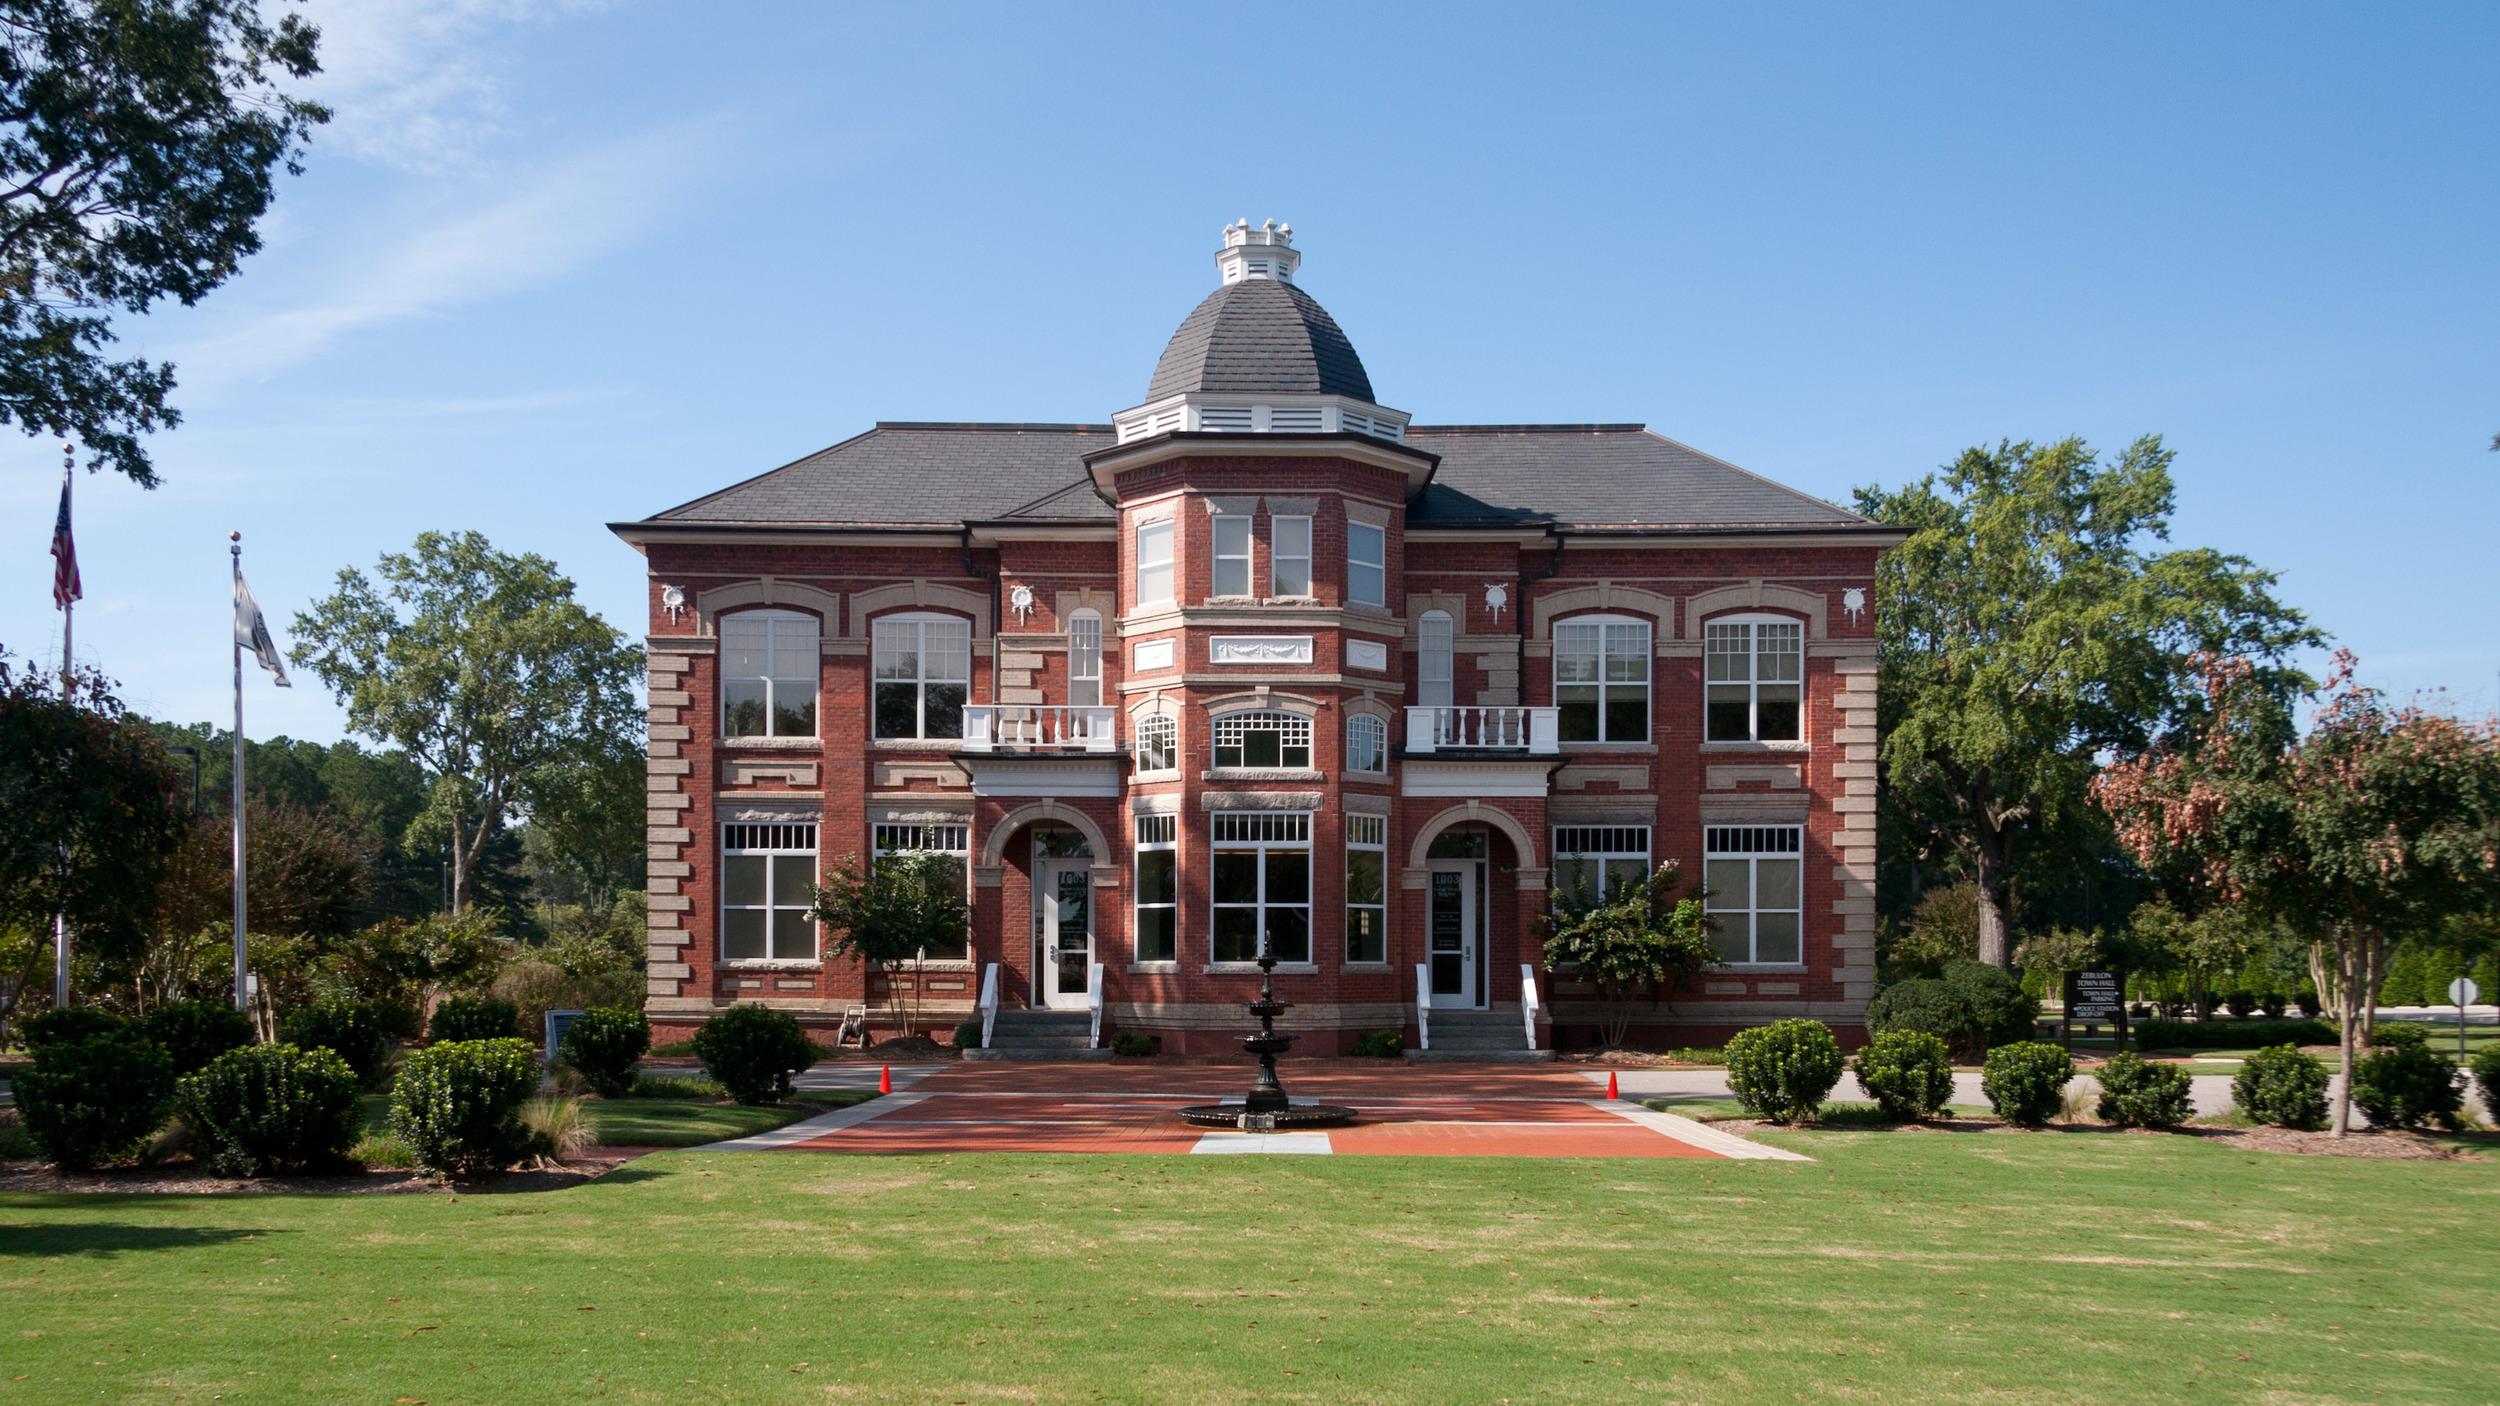 Town Hall, Zebulon